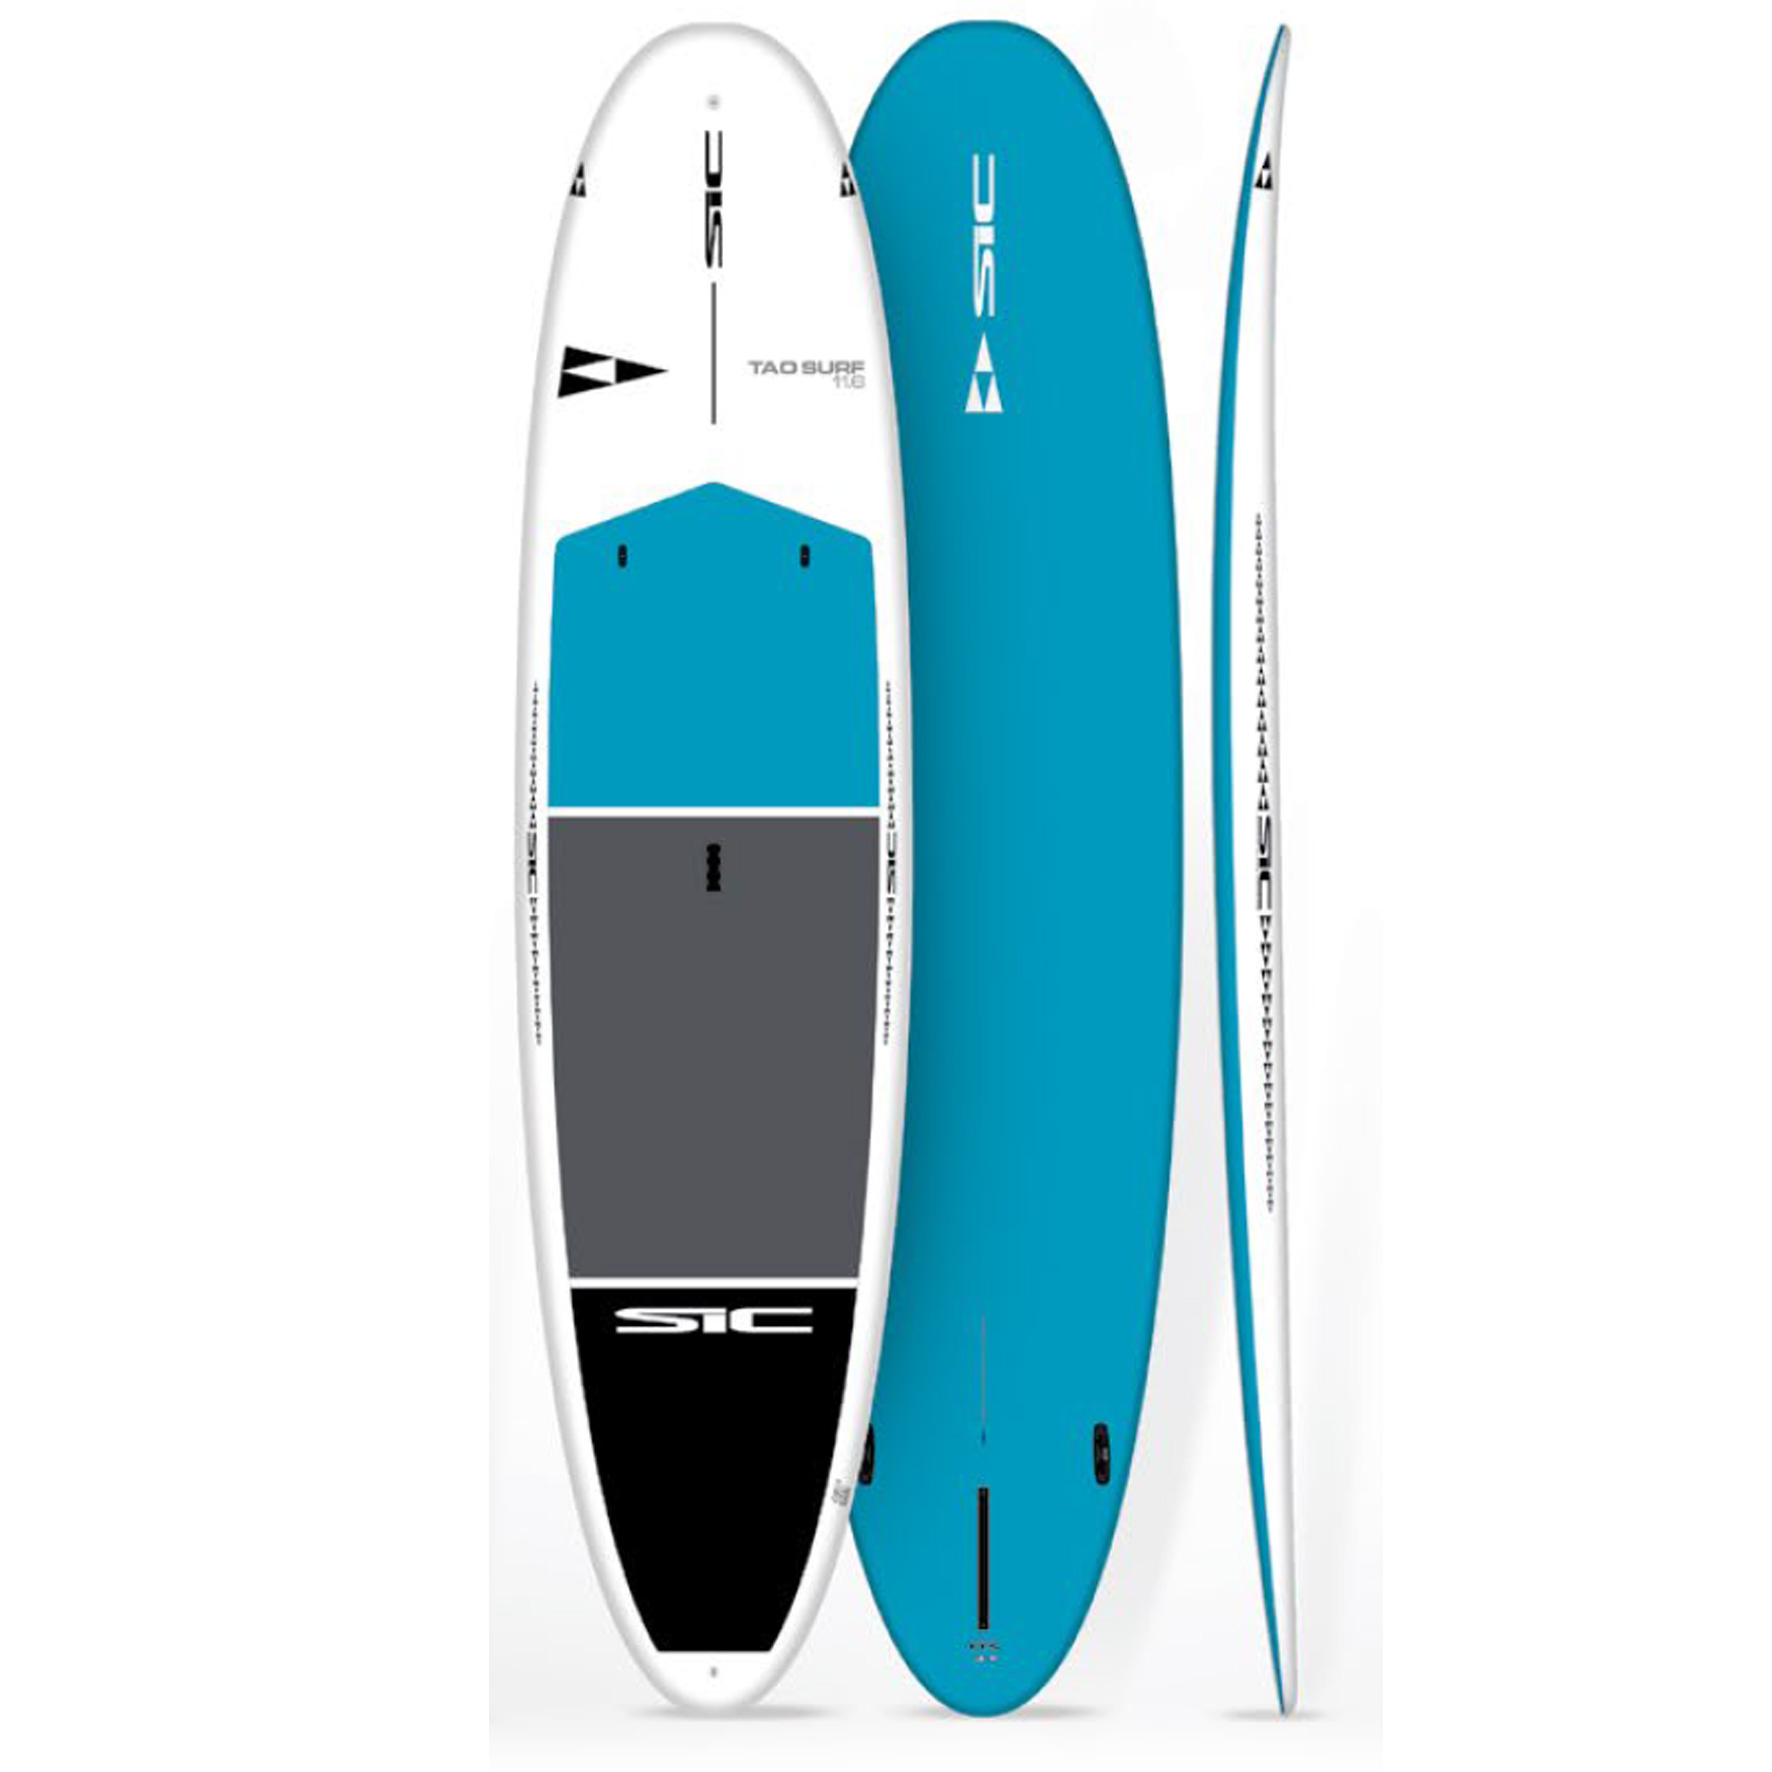 SIC-TAO-SURF-11